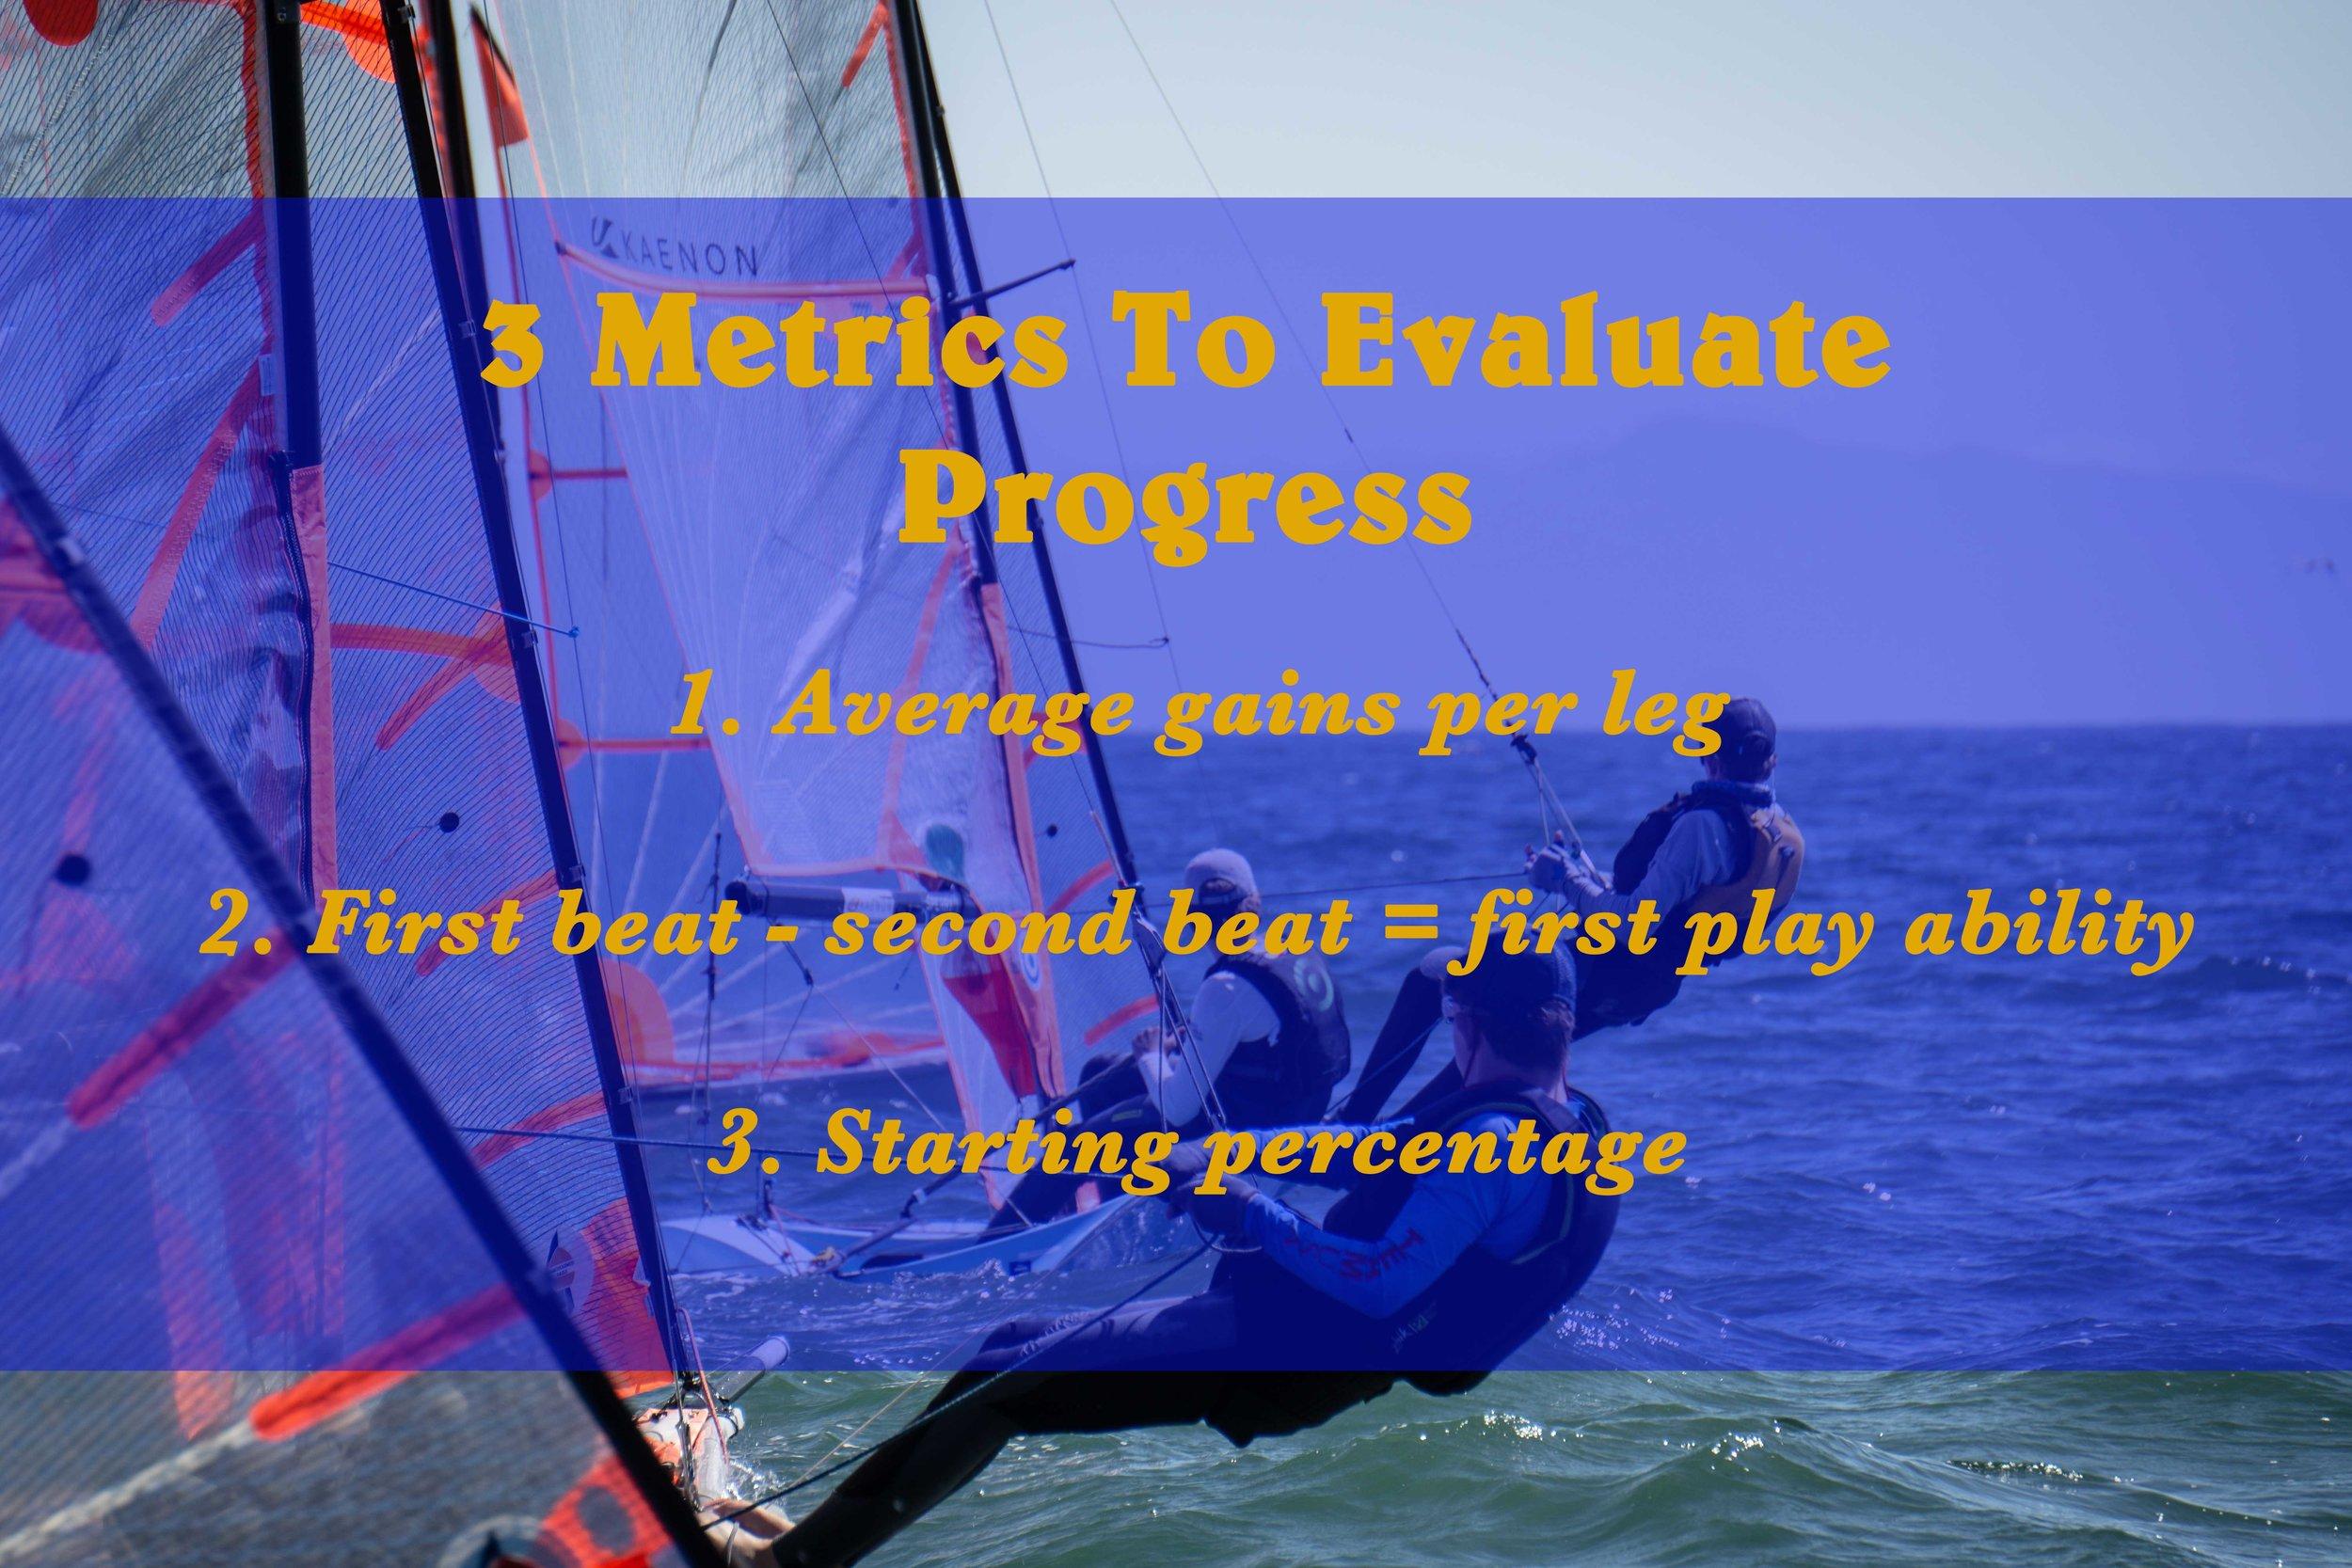 3ProgressMetrics.jpg